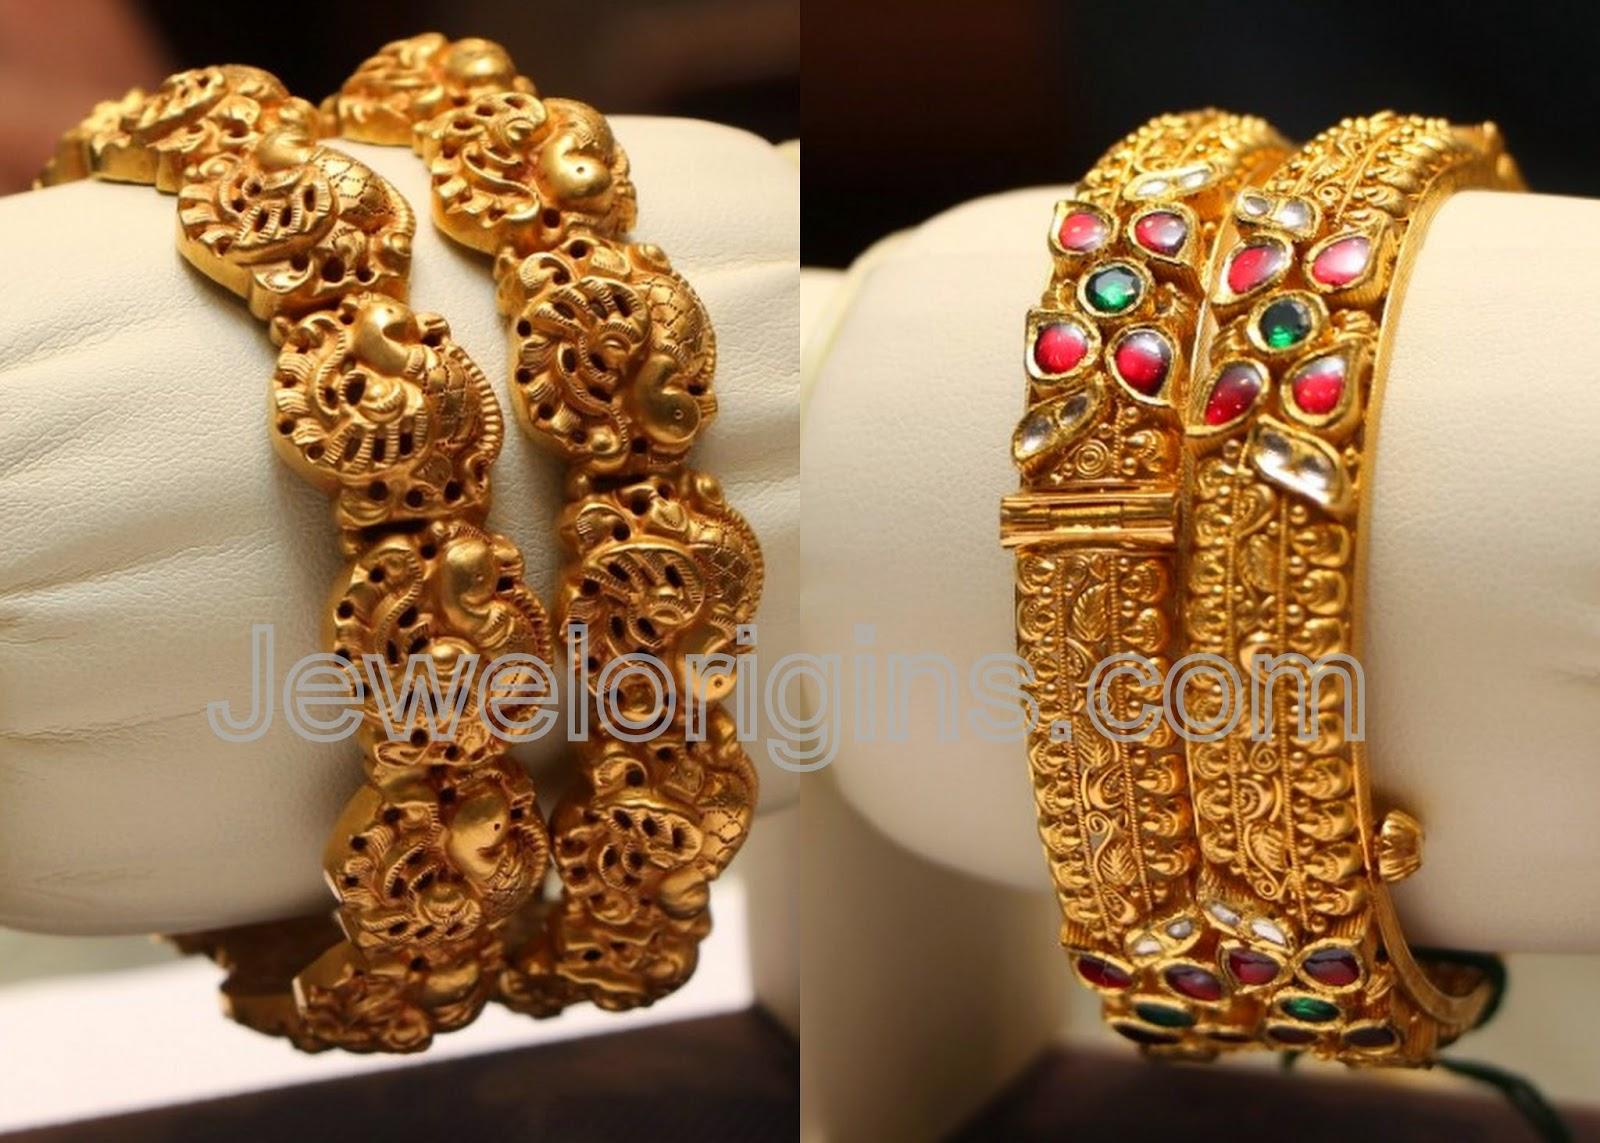 jewelorigins.com-Indian Designer Gold and Diamond ...